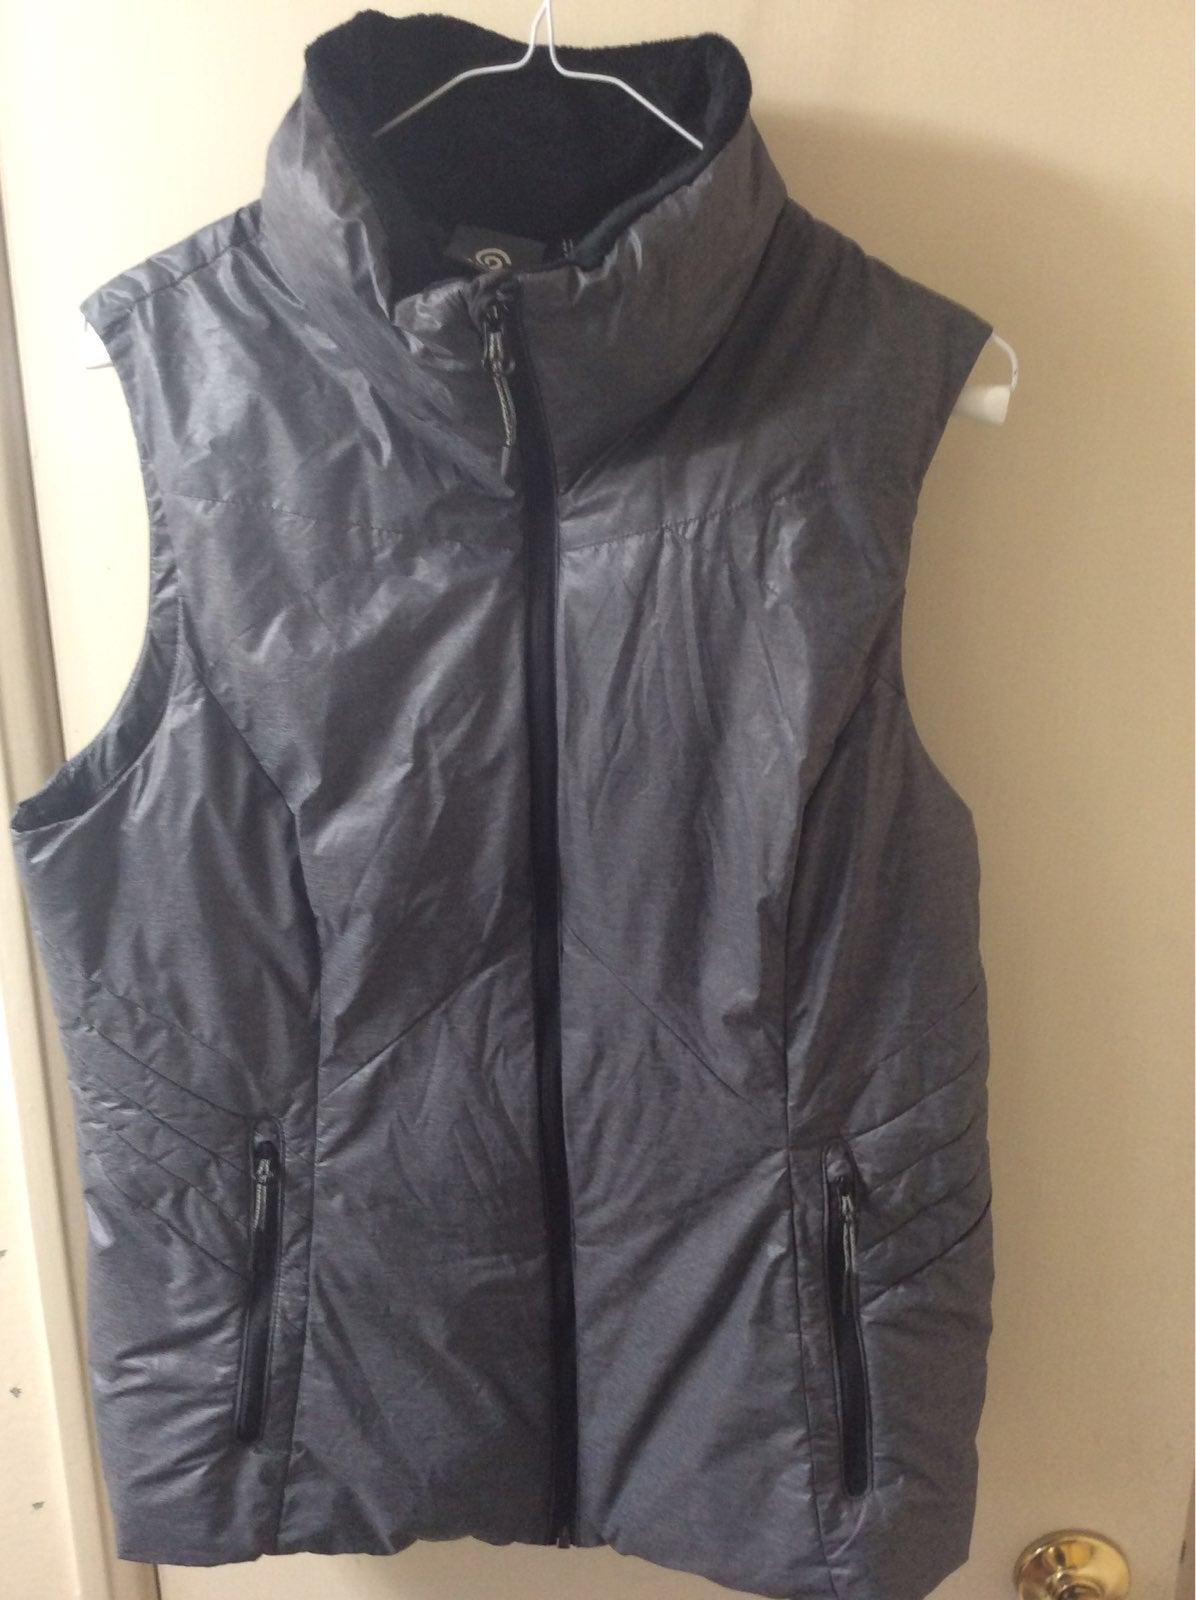 Puffer Vest size L